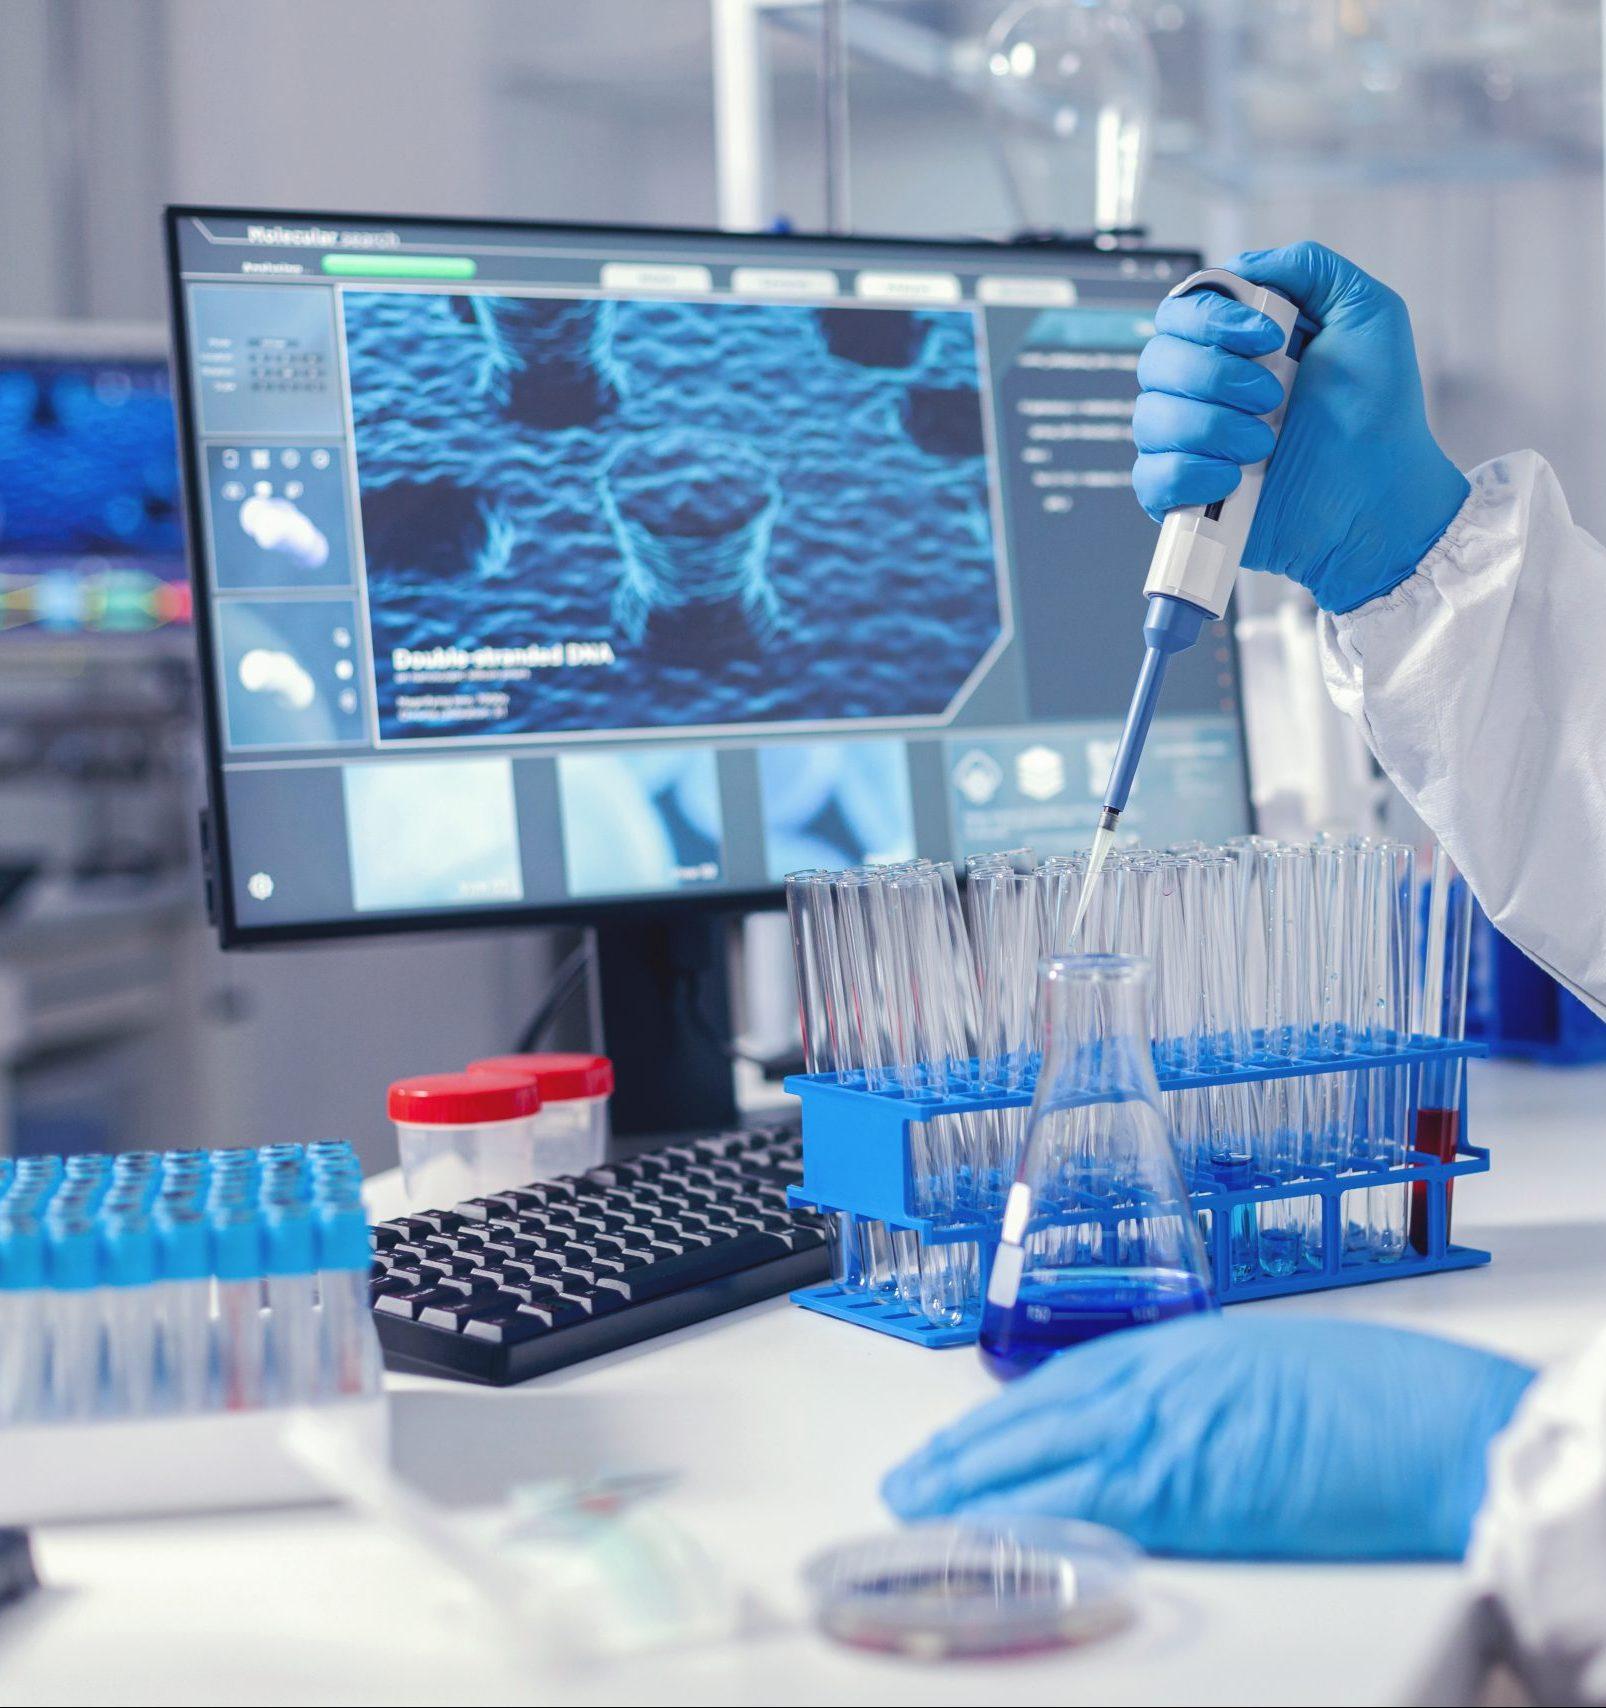 virolog-coducting-experiment